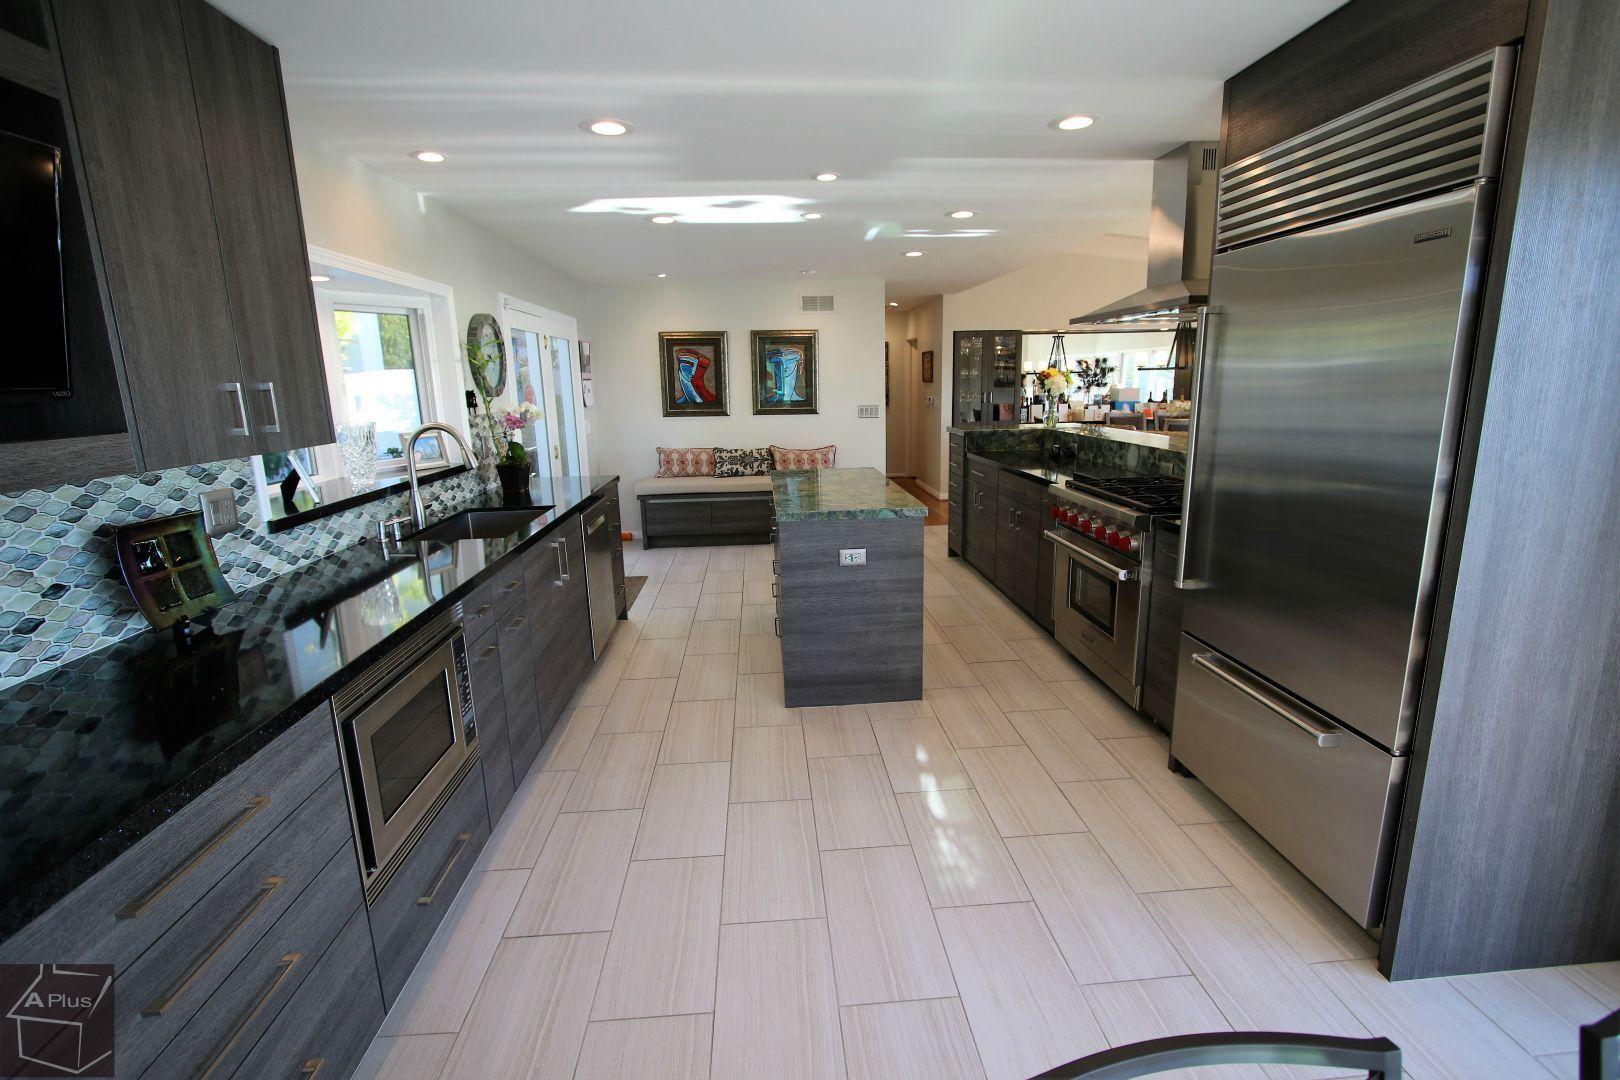 Kitchen Designer Orange County Stunning Design Build Contemporary Modern #kitchenremodel With Sophia Line Review